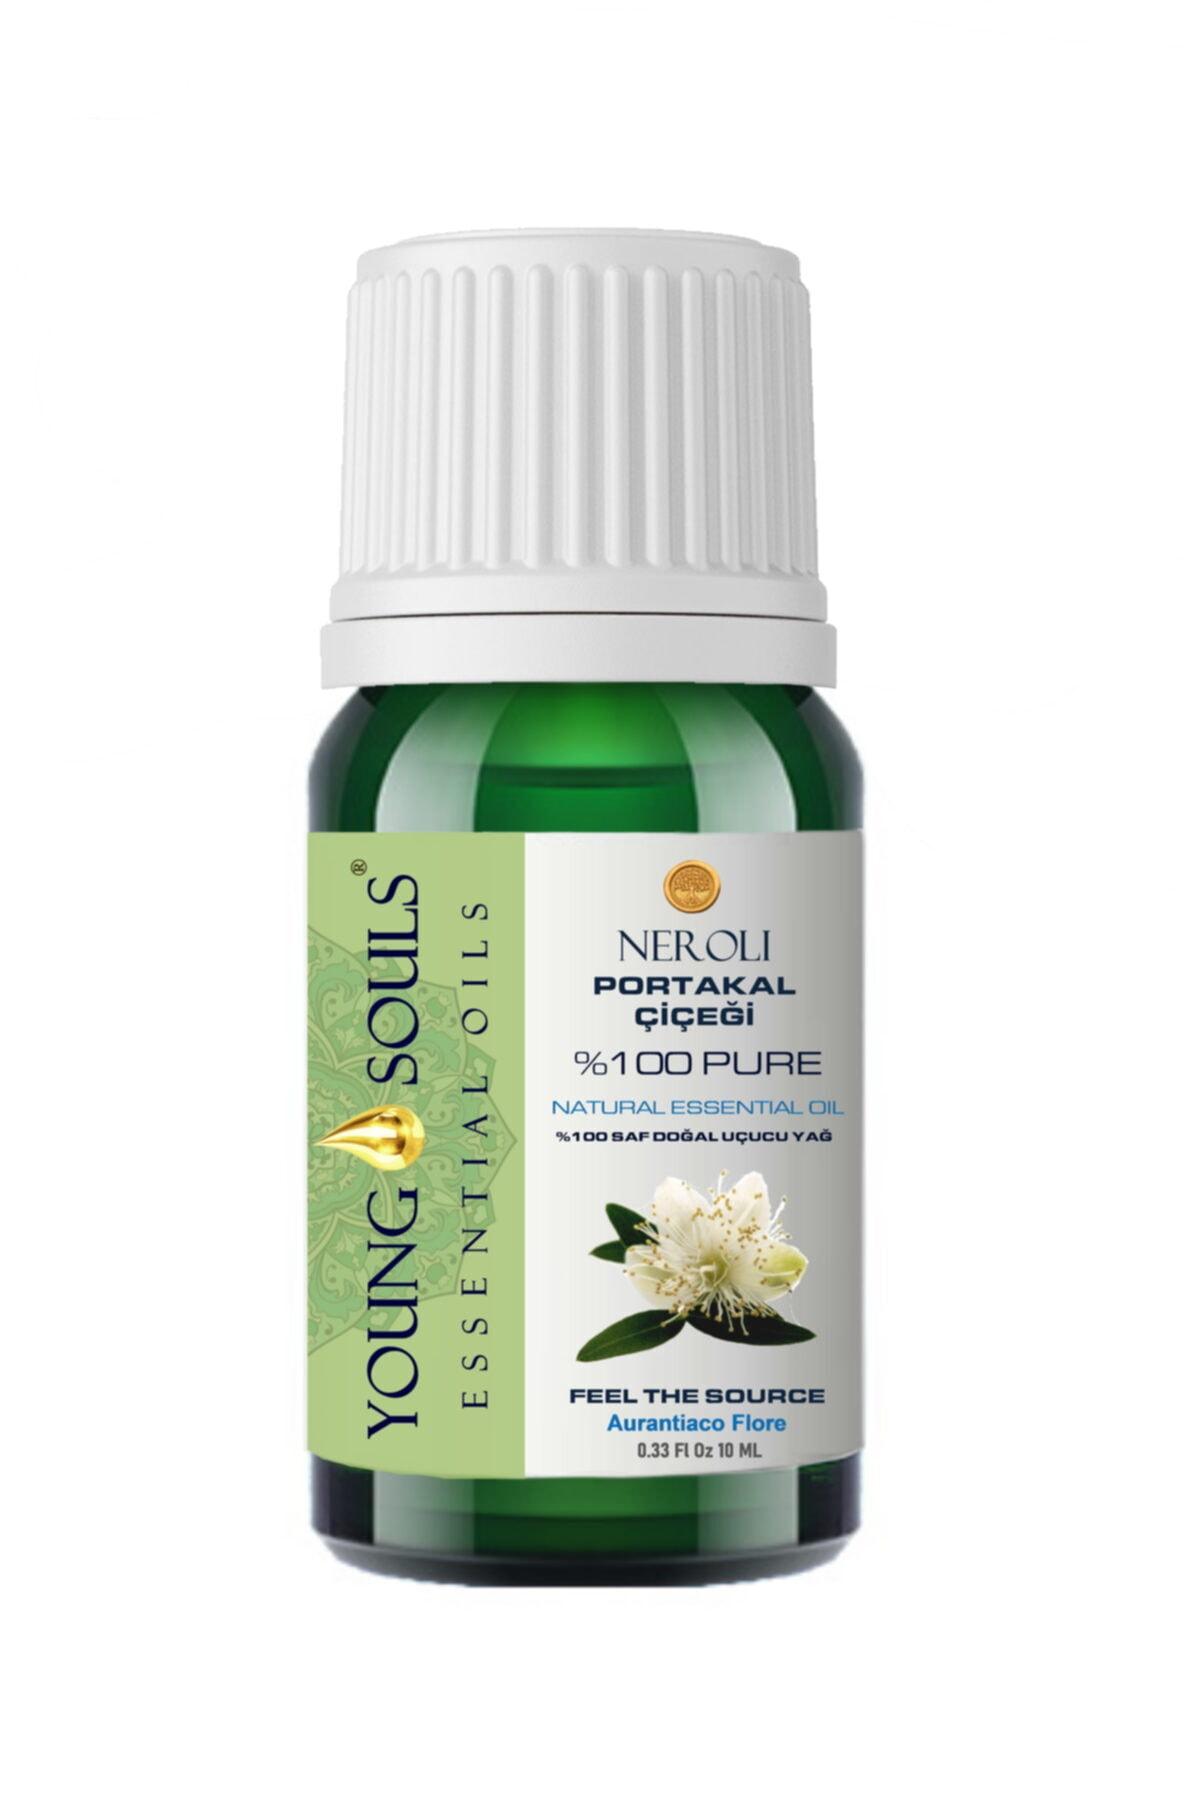 YOUNG SOULS Portakal Çiçeği Uçucu Yağ (essential Oil) Saf Natural 10 ml 1